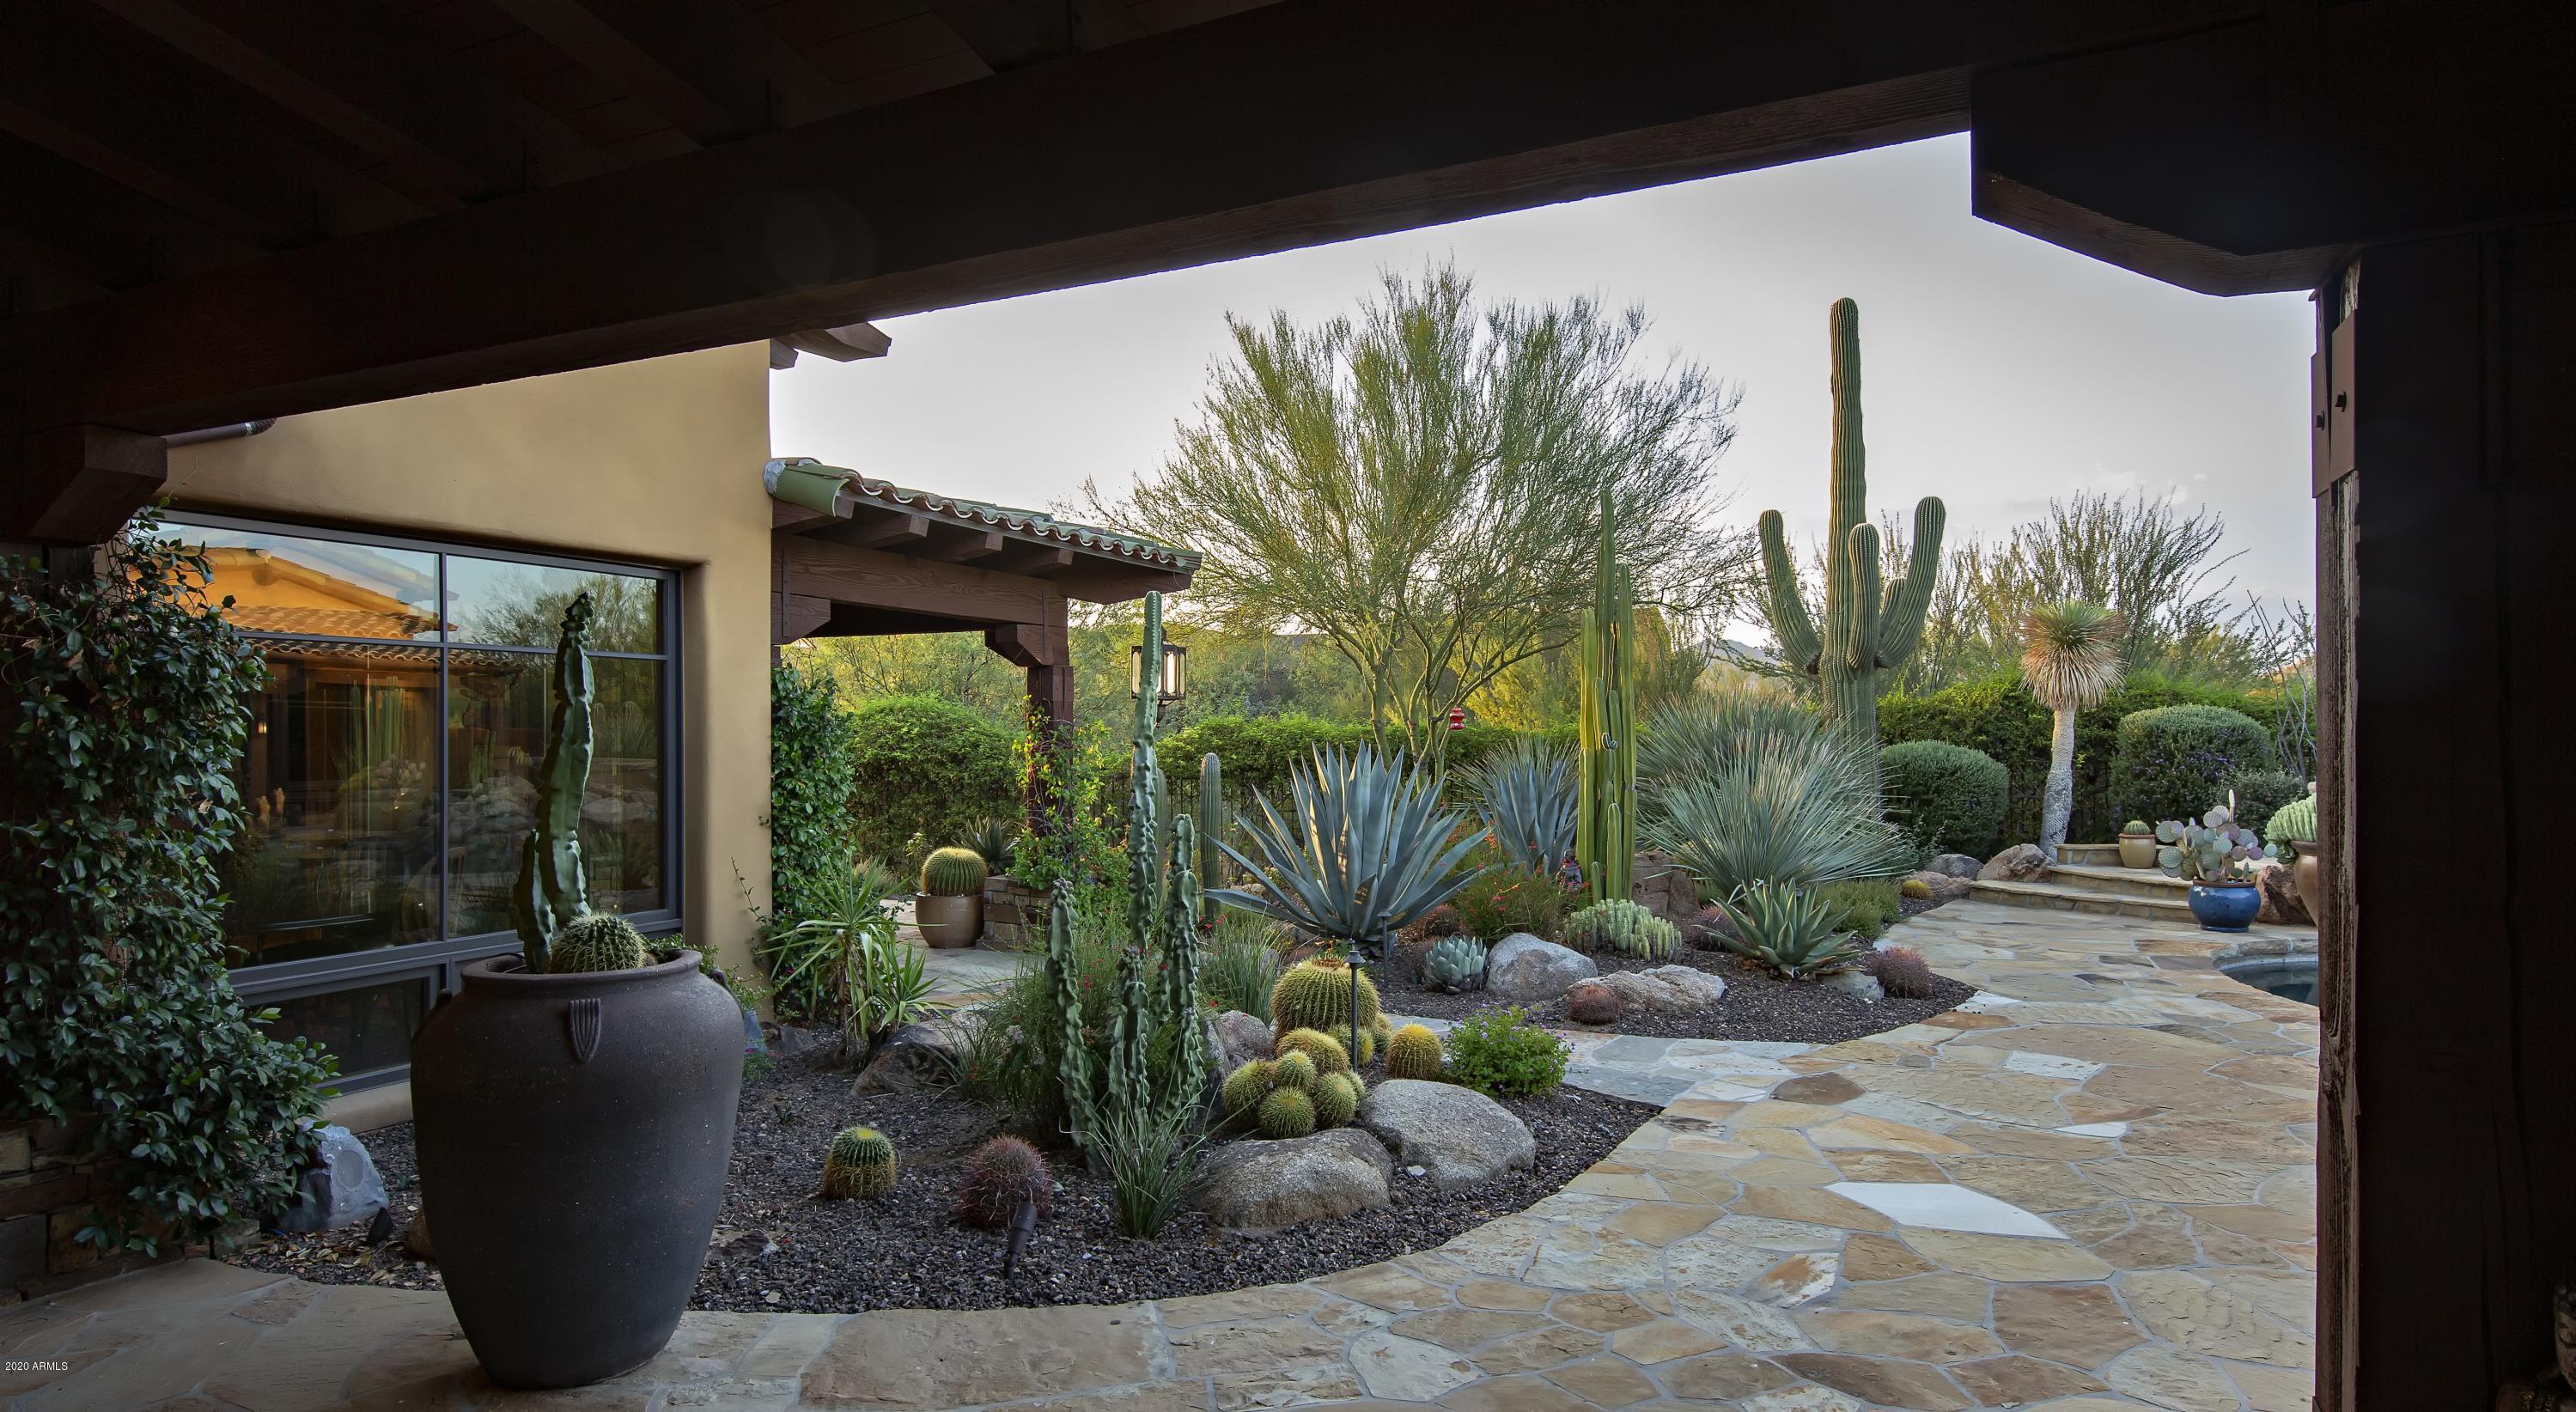 7689 WHISPER ROCK Trail, Scottsdale, Arizona 85266, 5 Bedrooms Bedrooms, ,5.5 BathroomsBathrooms,Residential,For Sale,WHISPER ROCK,6136653